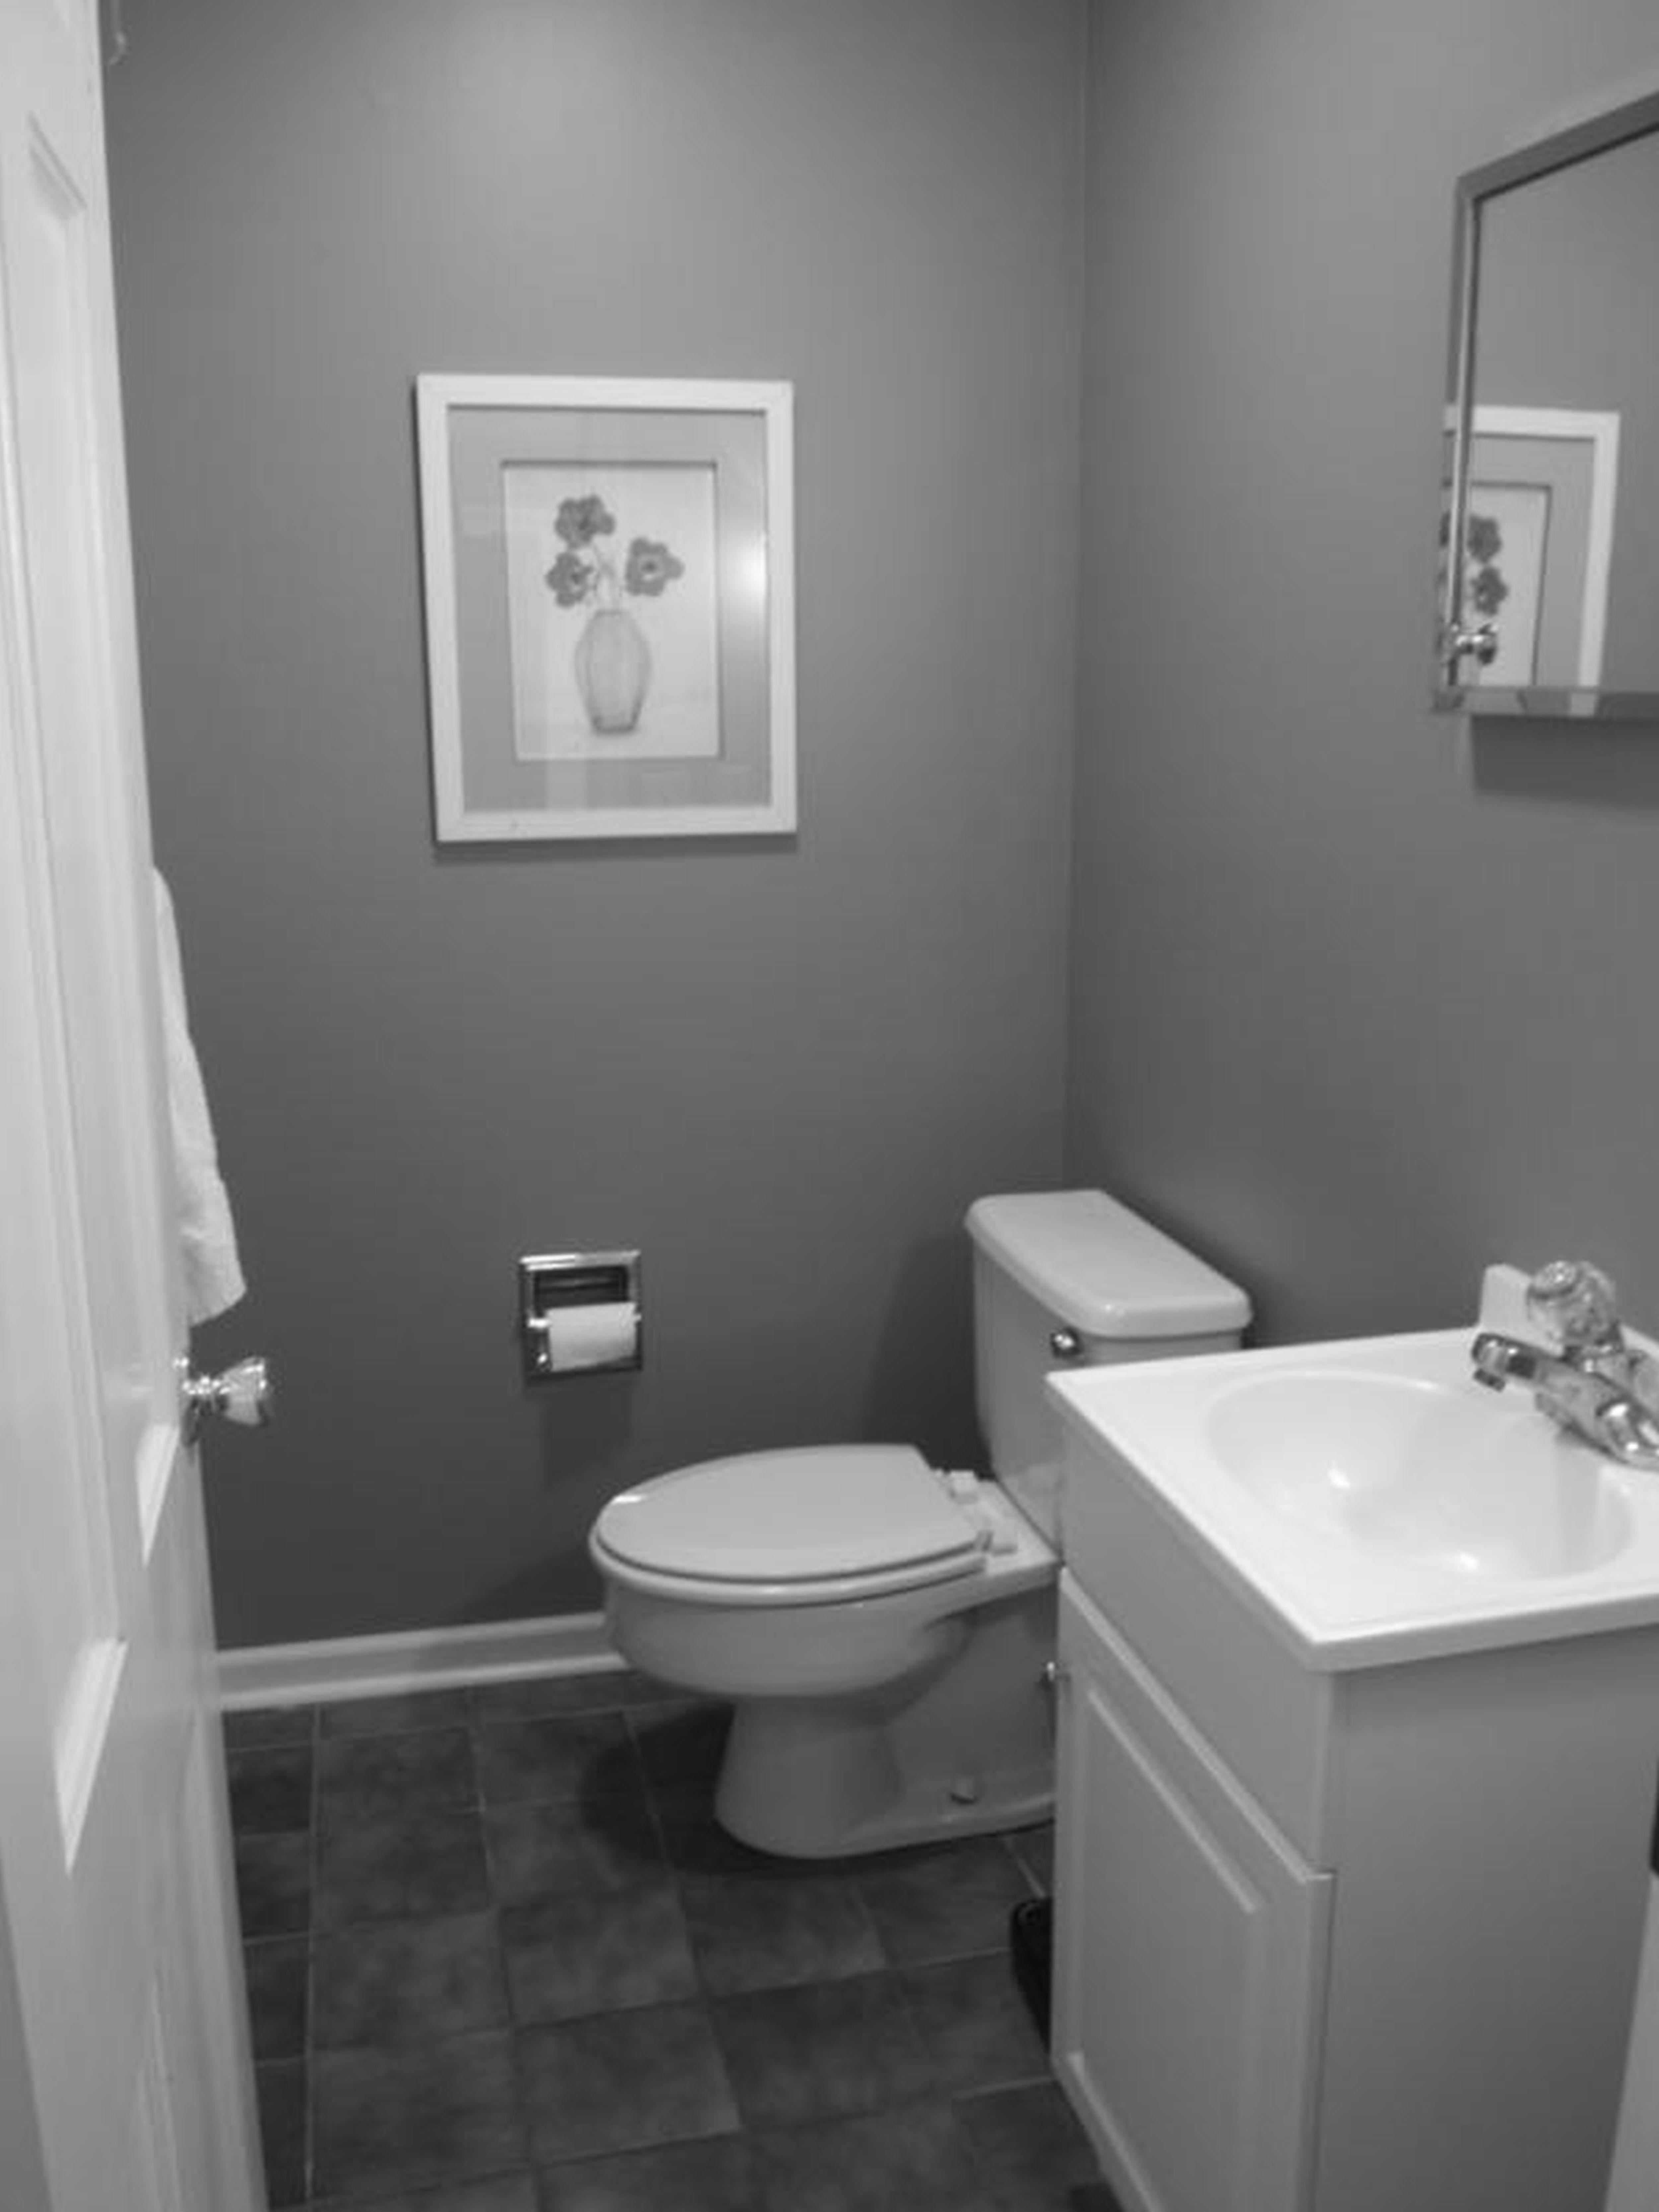 Bathroom Color Ideas Best Paint And Color Schemes For Bathroom Badezimmer Ohne Fenster Badezimmer Farben Kleine Badezimmer